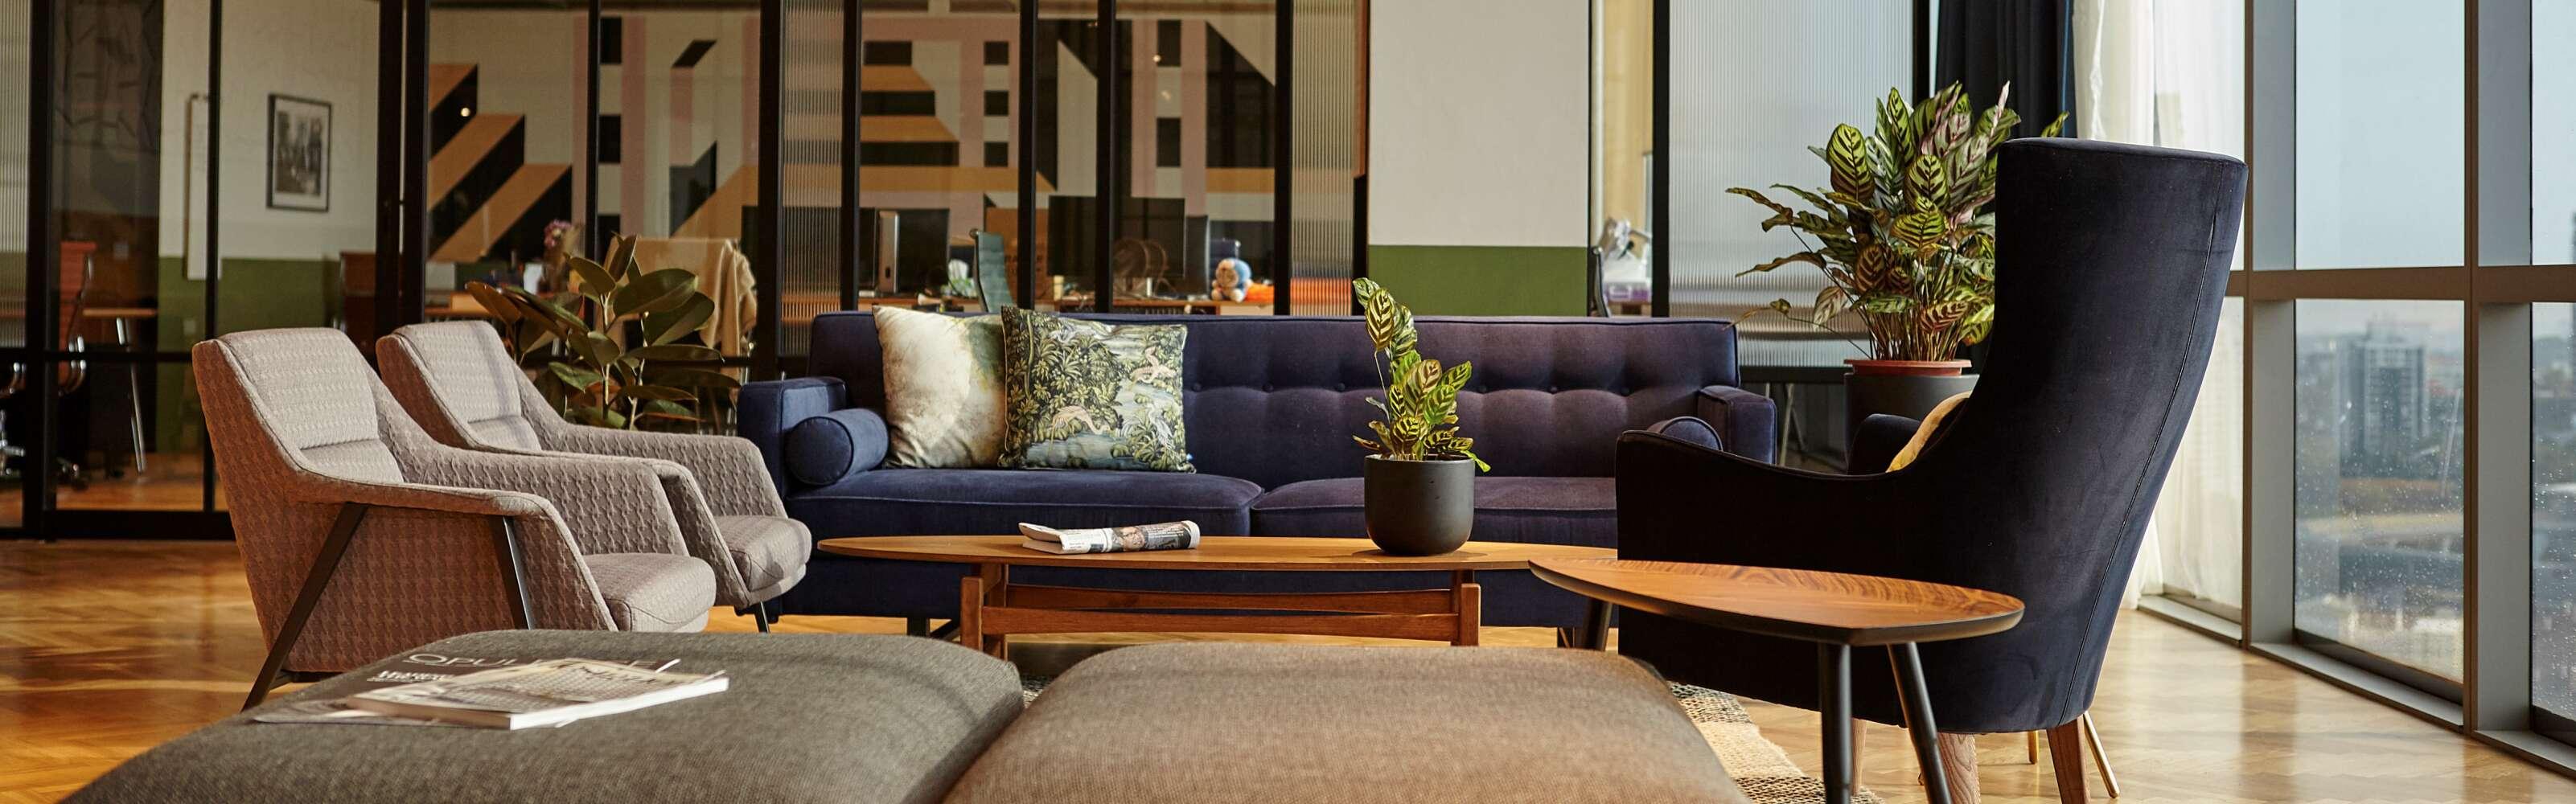 Lounge in Wisma UOA Damansara Heights | Common Ground